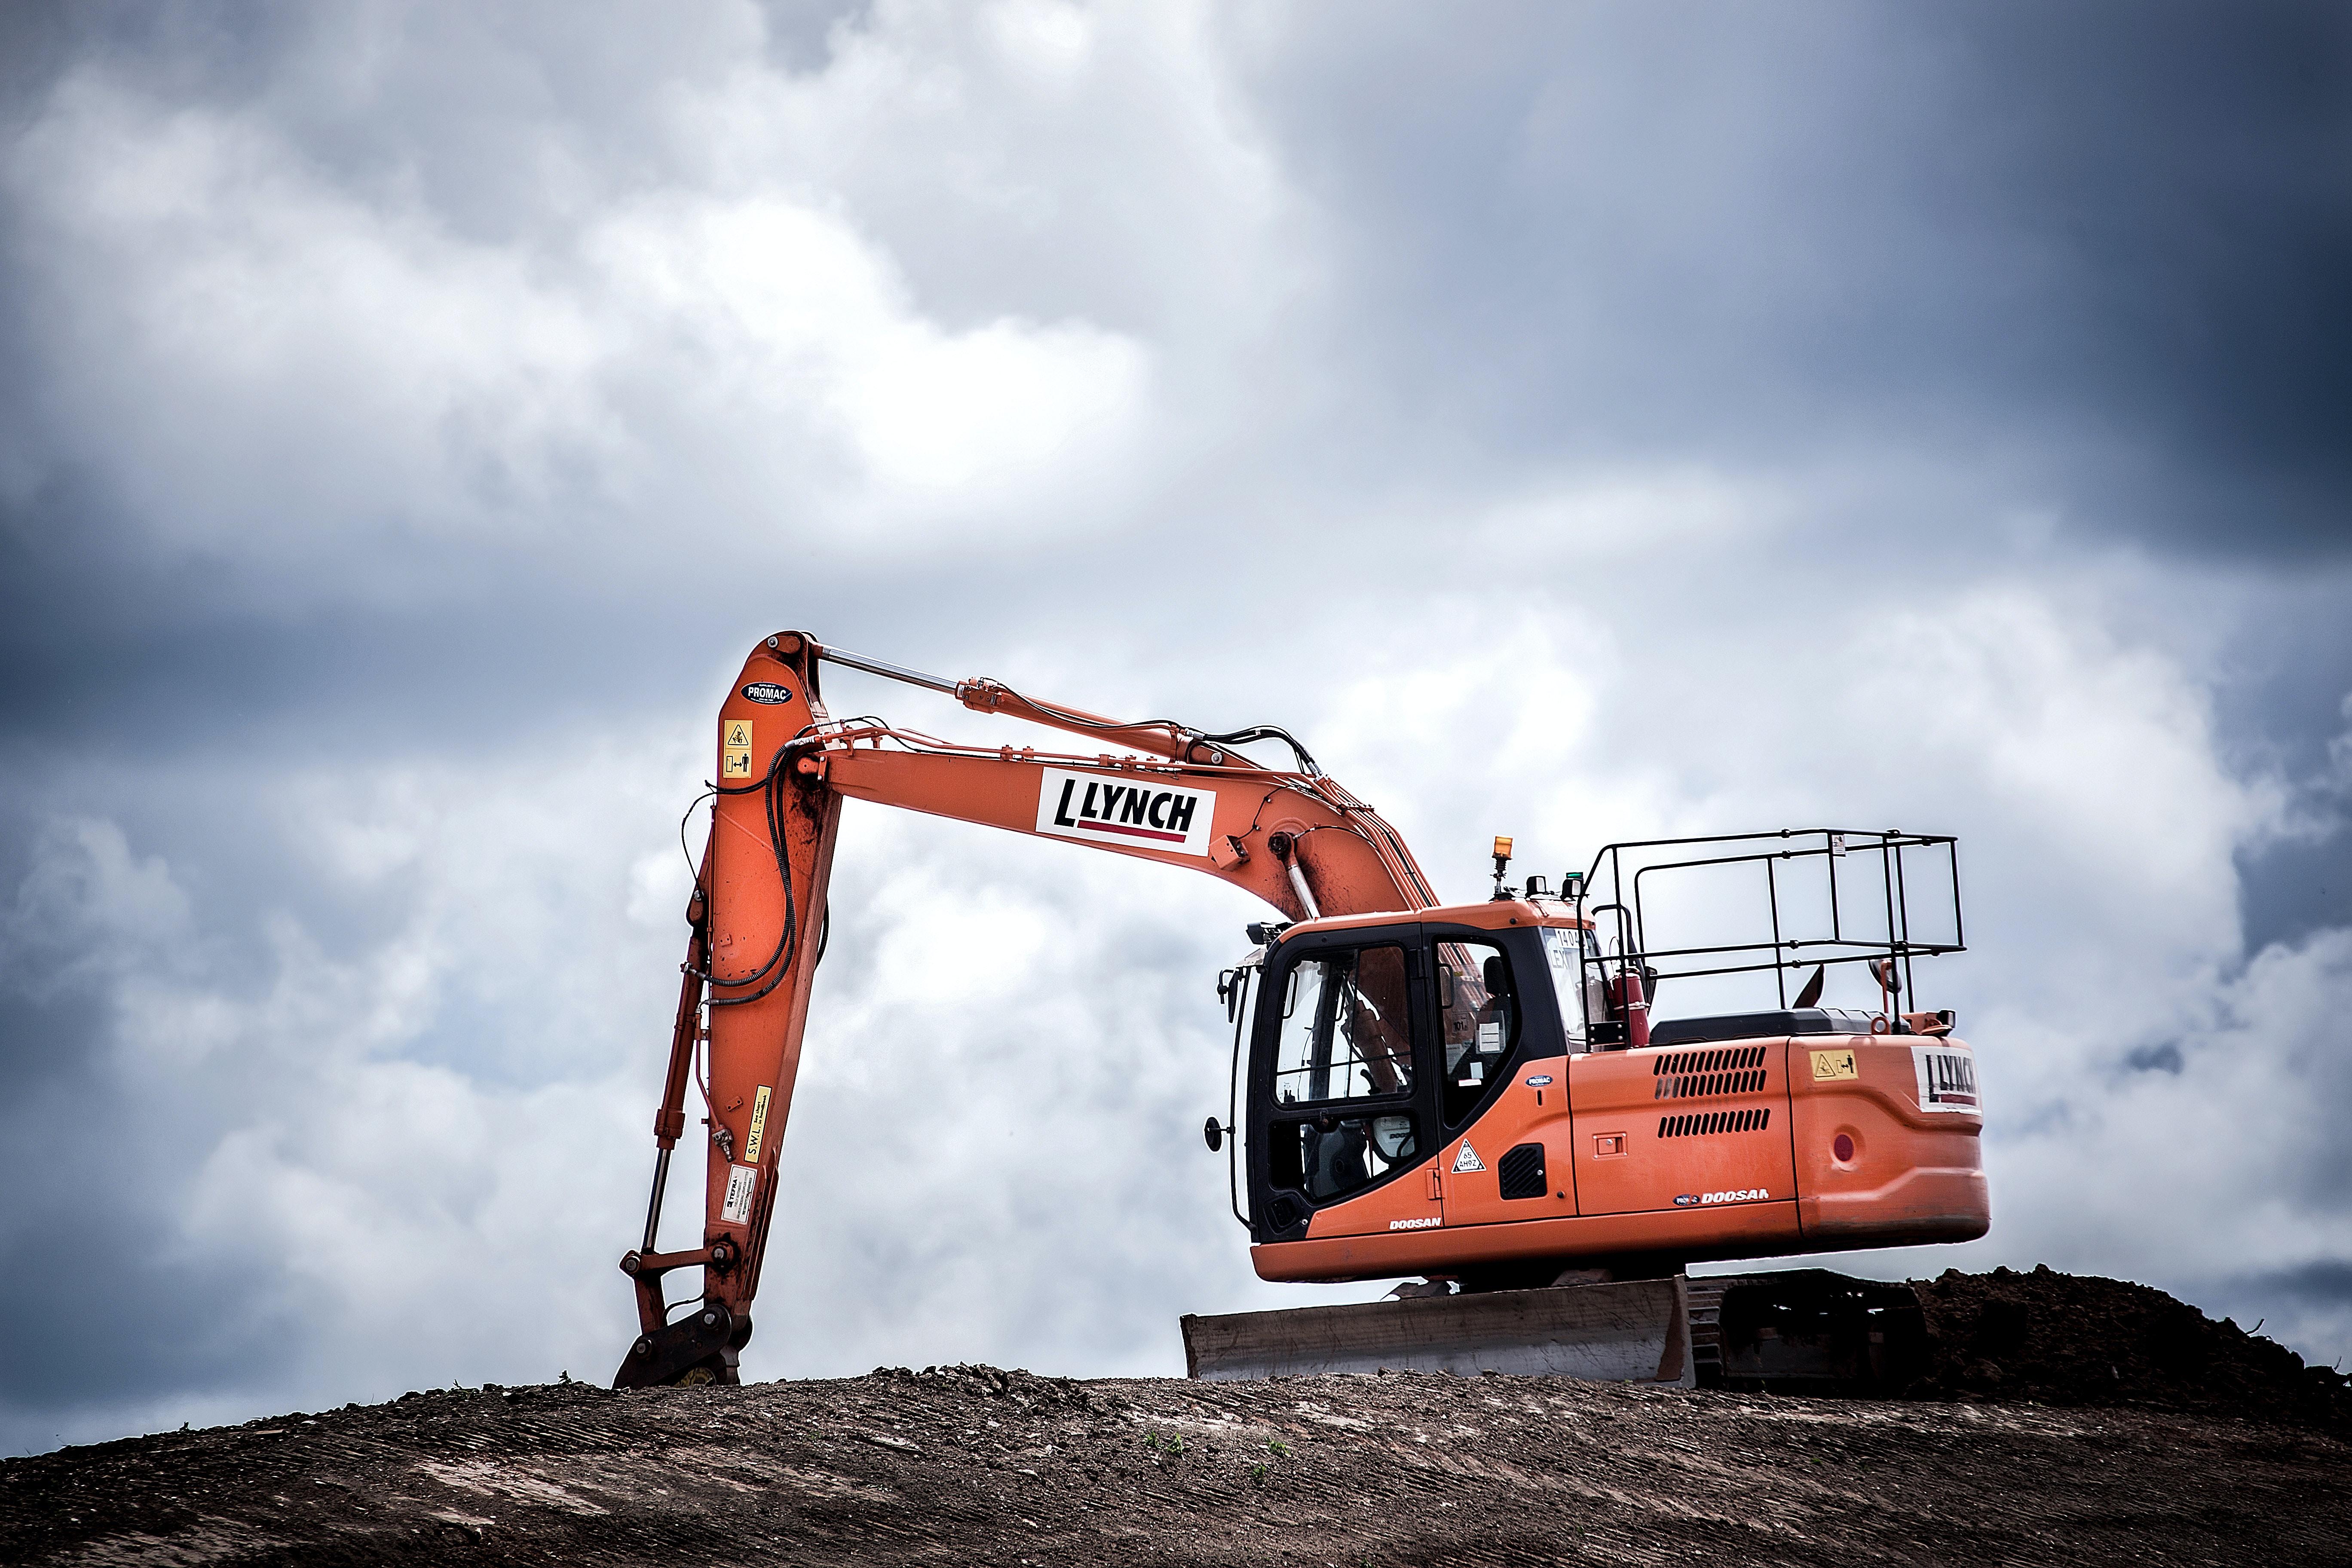 An orange excavator at a construction site